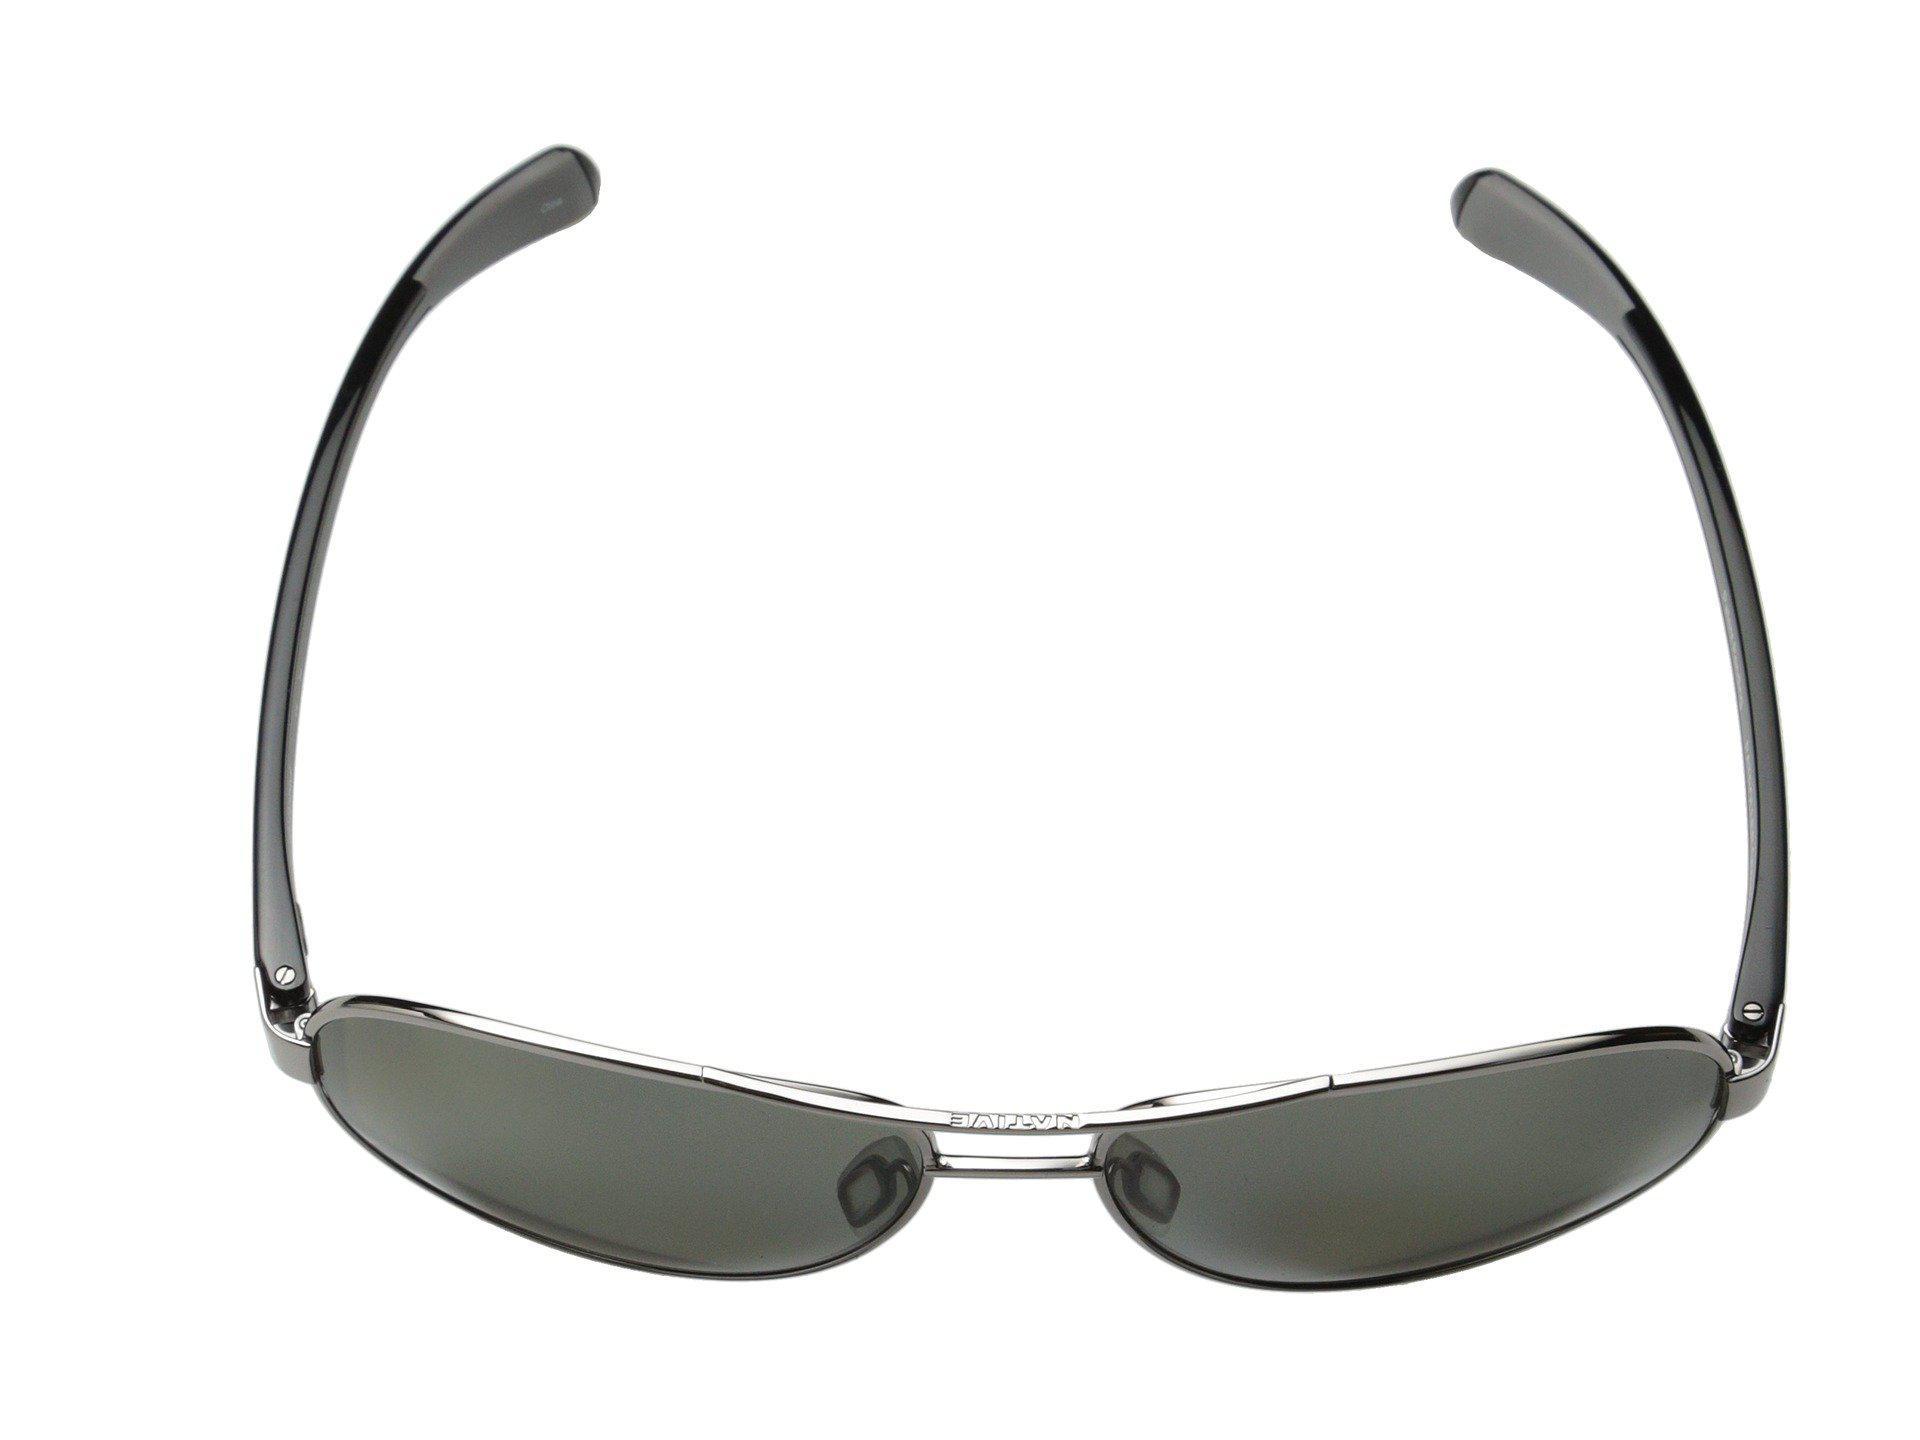 805518b296 Lyst - Native Eyewear Patroller (chrome iron gray) Sport Sunglasses ...